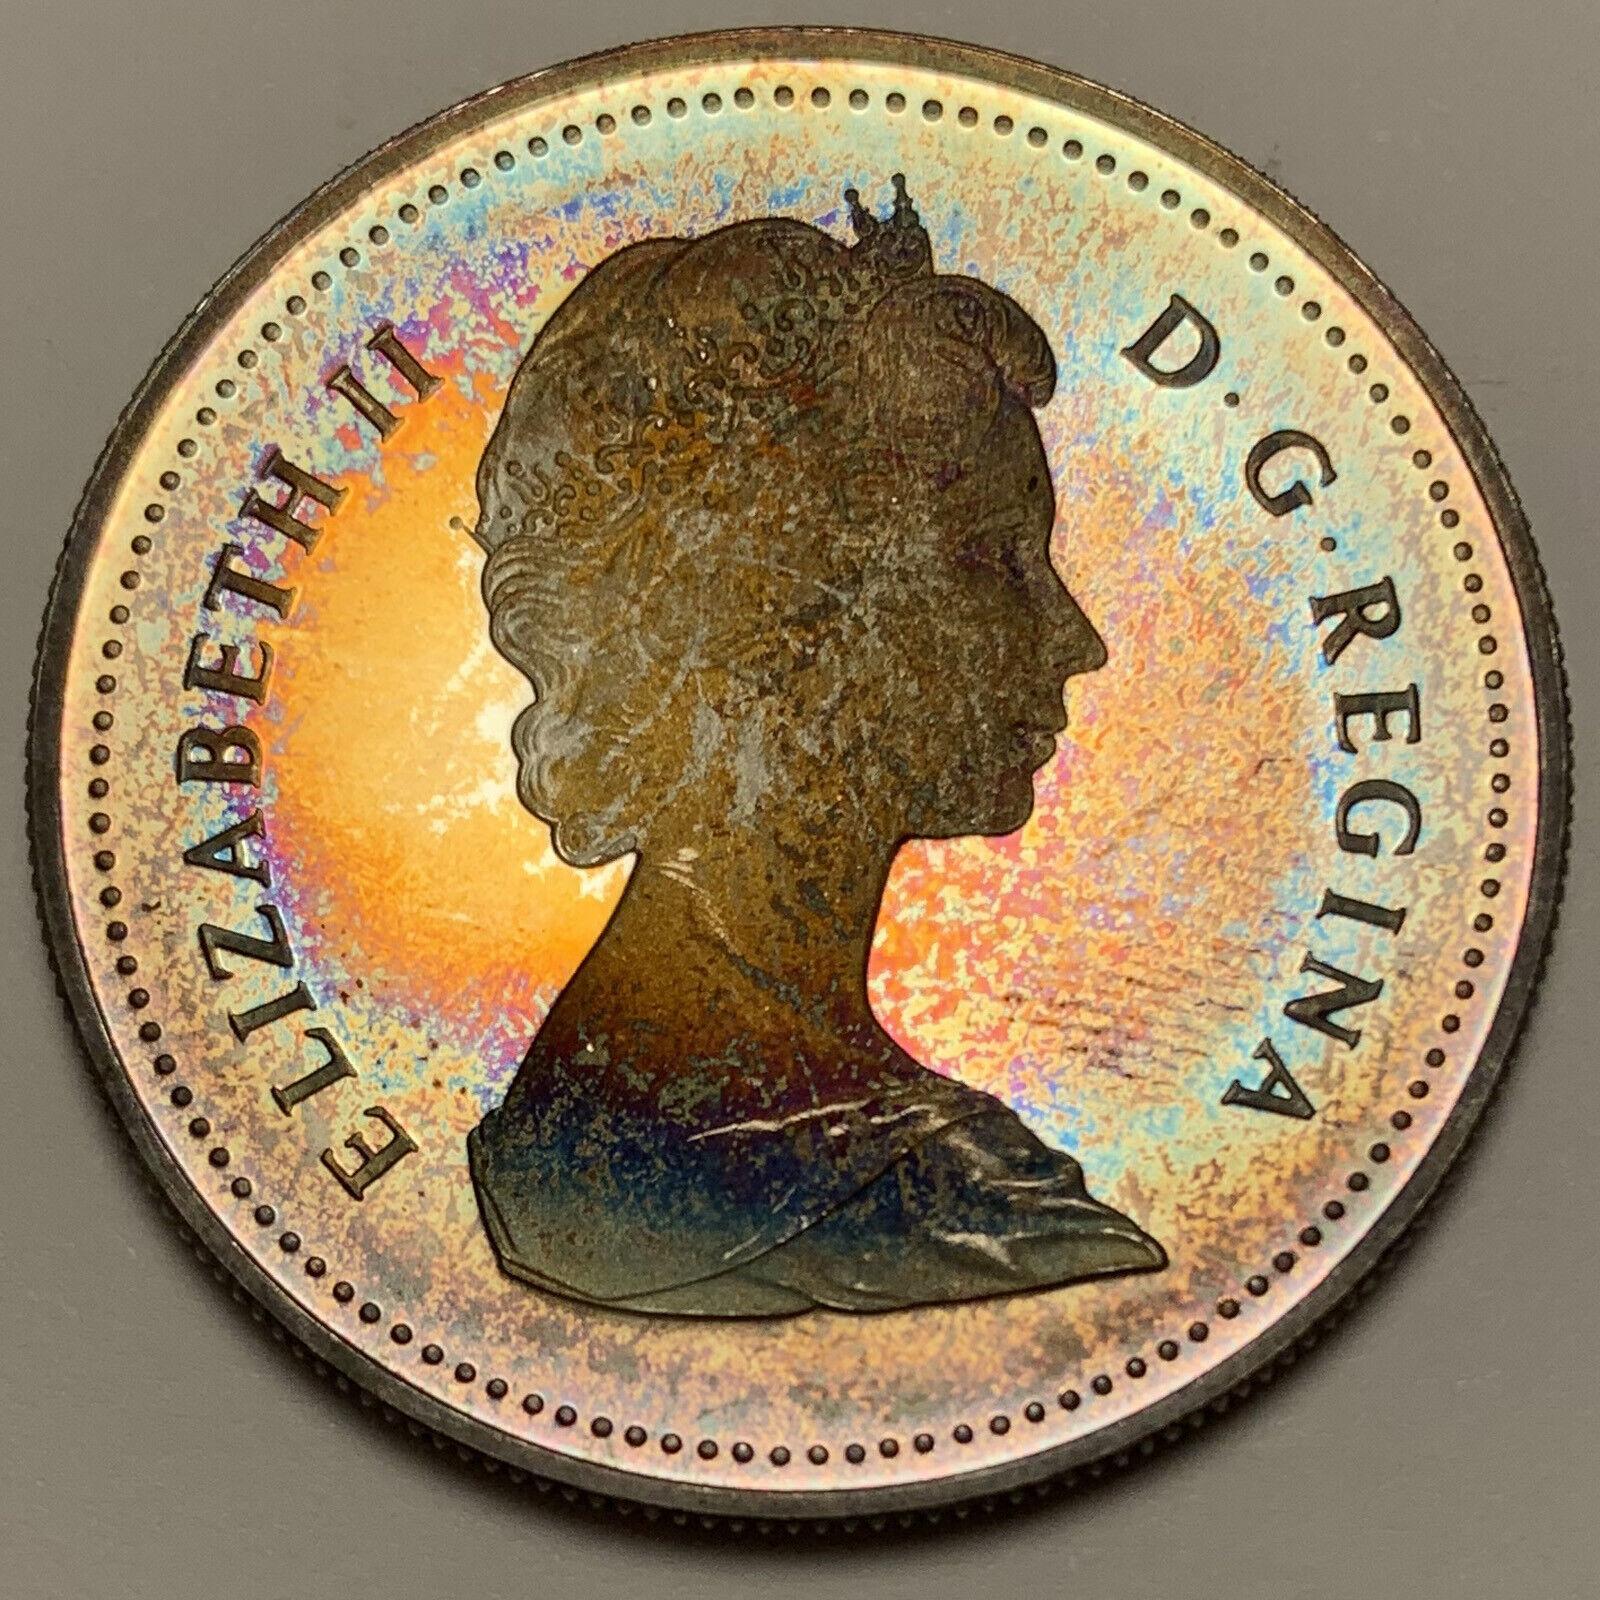 1984 CANADA SILVER DOLLAR PROOF COLOR UNC BU WONDERFUL TONED NEON RAINBOW DR  - $24.99